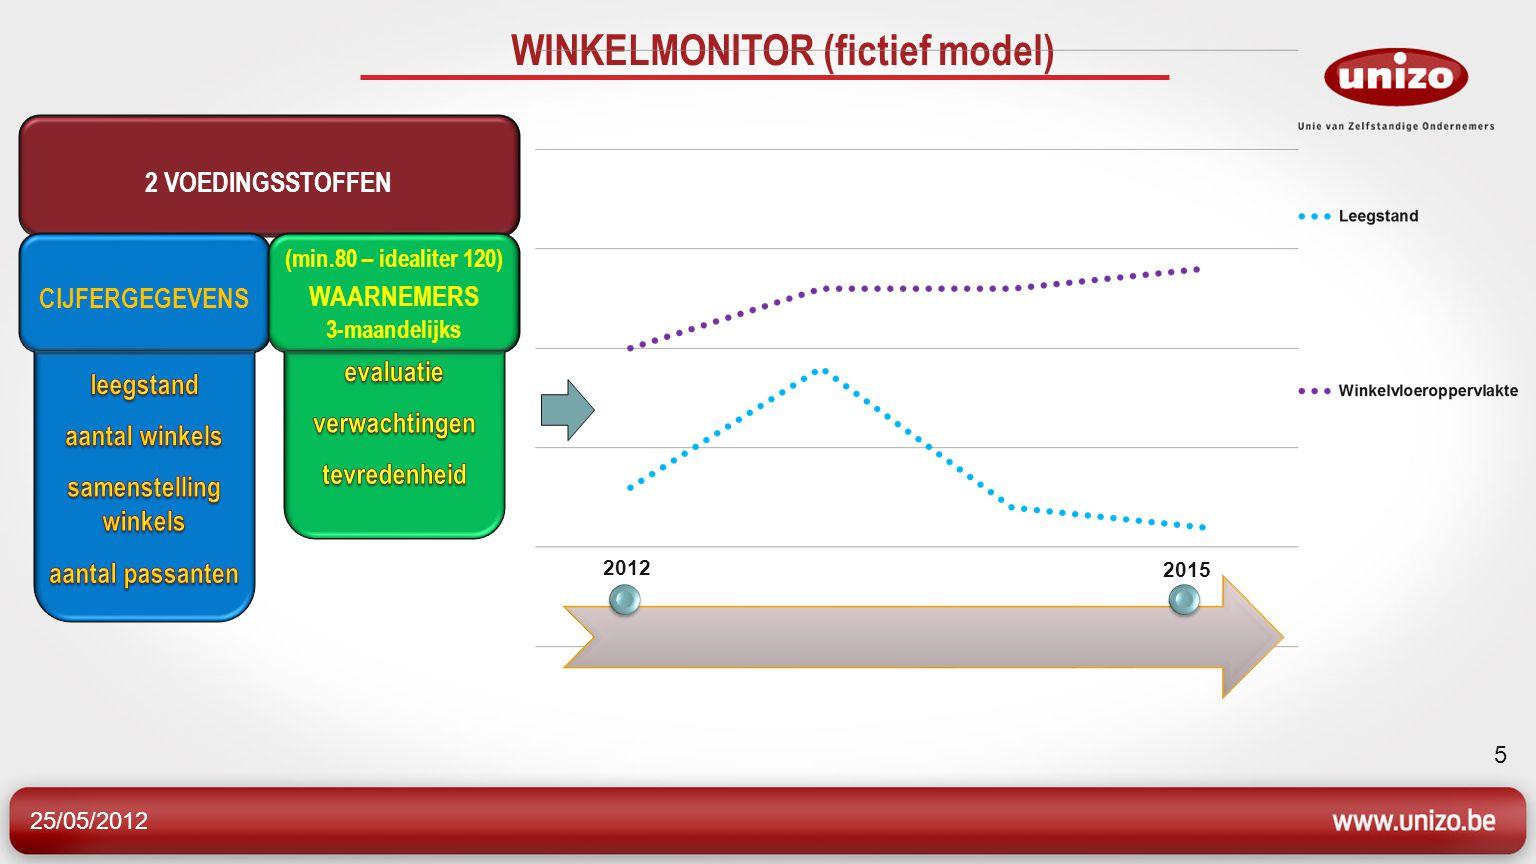 25/05/2012 5 2 VOEDINGSSTOFFEN WINKELMONITOR (fictief model) 2012 2015 CIJFERGEGEVENS (min.80 – idealiter 120) WAARNEMERS 3-maandelijks